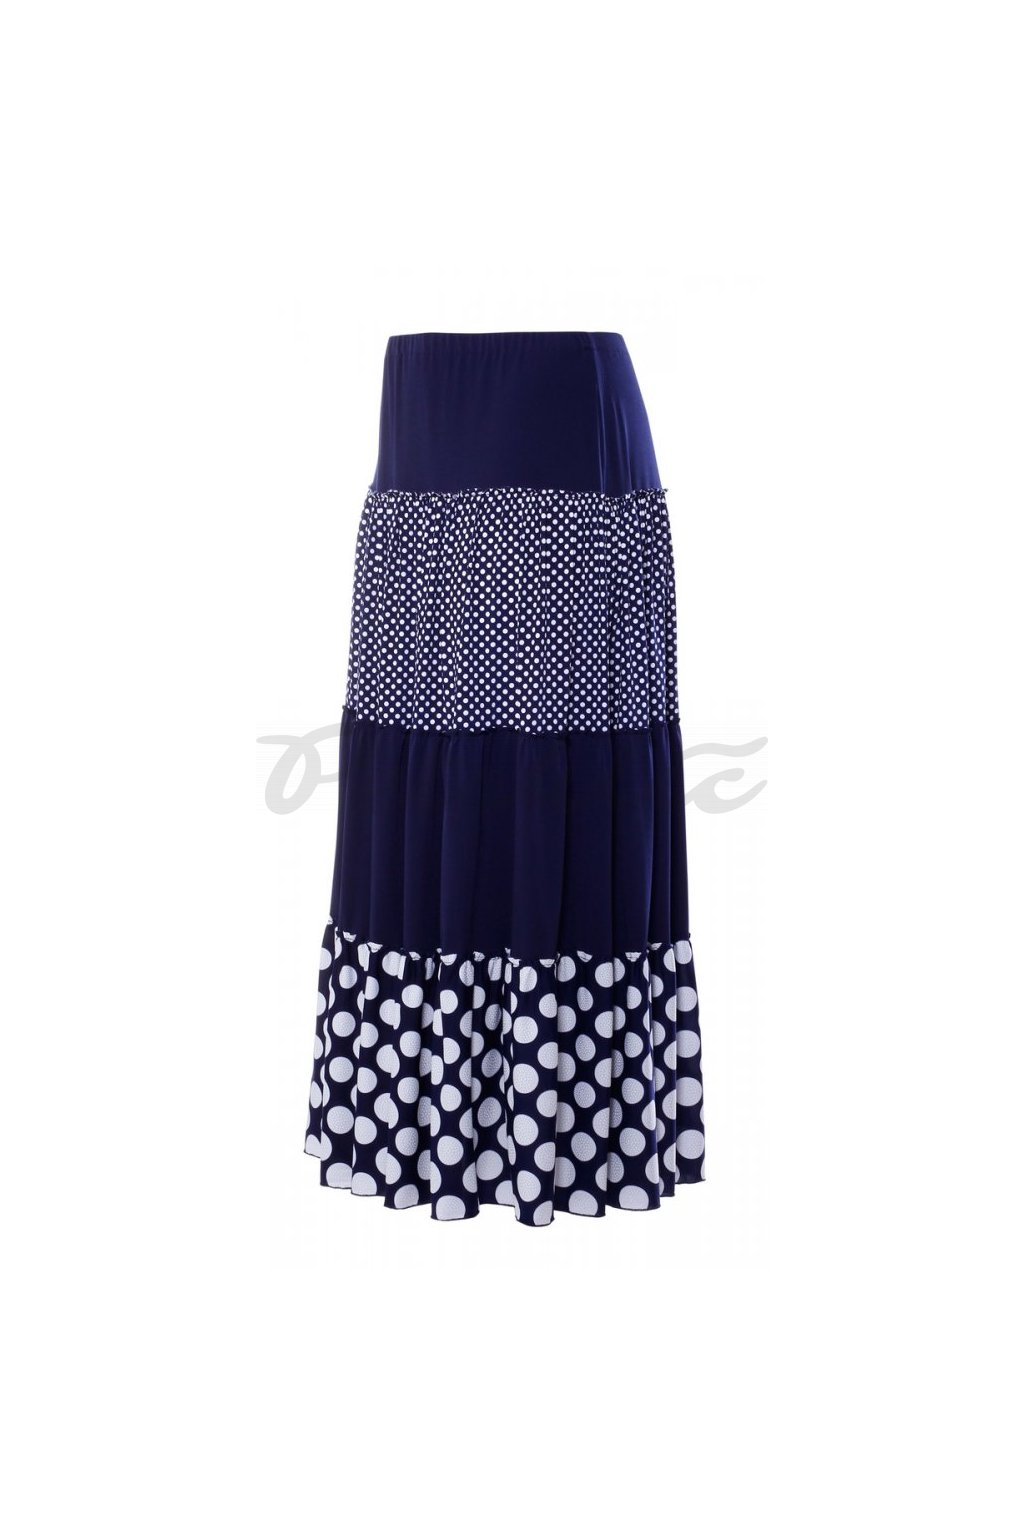 SIMČA sukně 90 - 95 cm